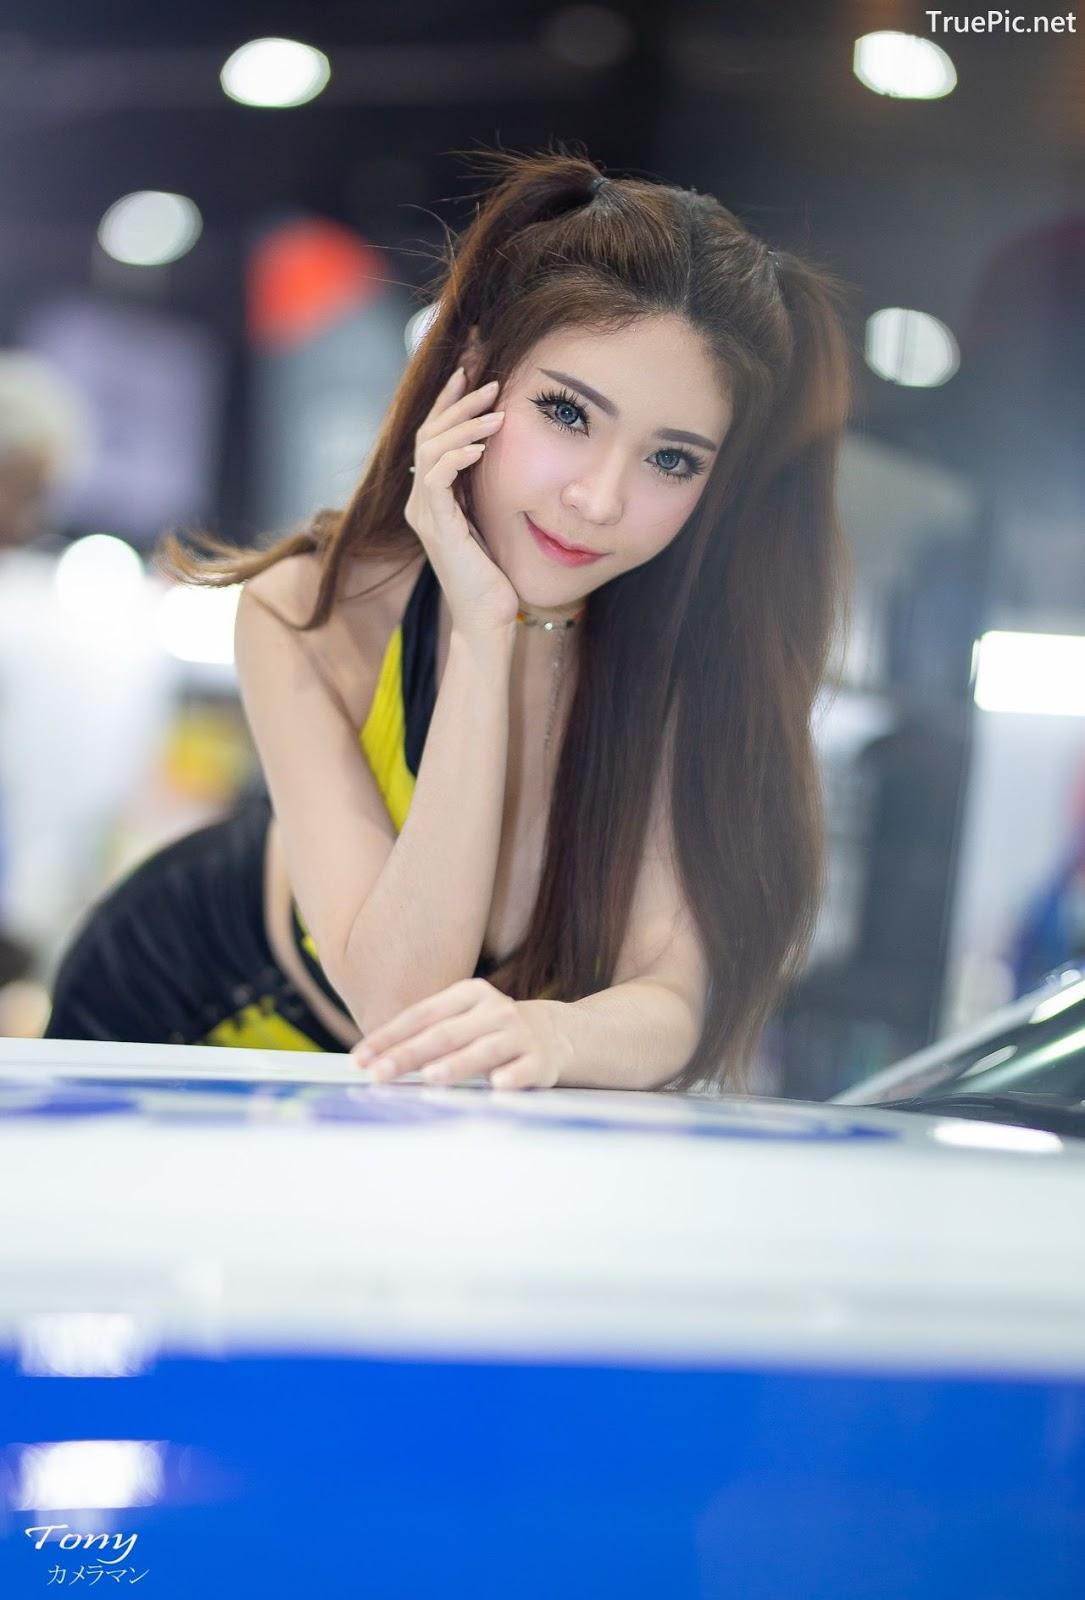 Image-Thailand-Hot-Model-Thai-Racing-Girl-At-Bangkok-Auto-Salon-2019-TruePic.net- Picture-7